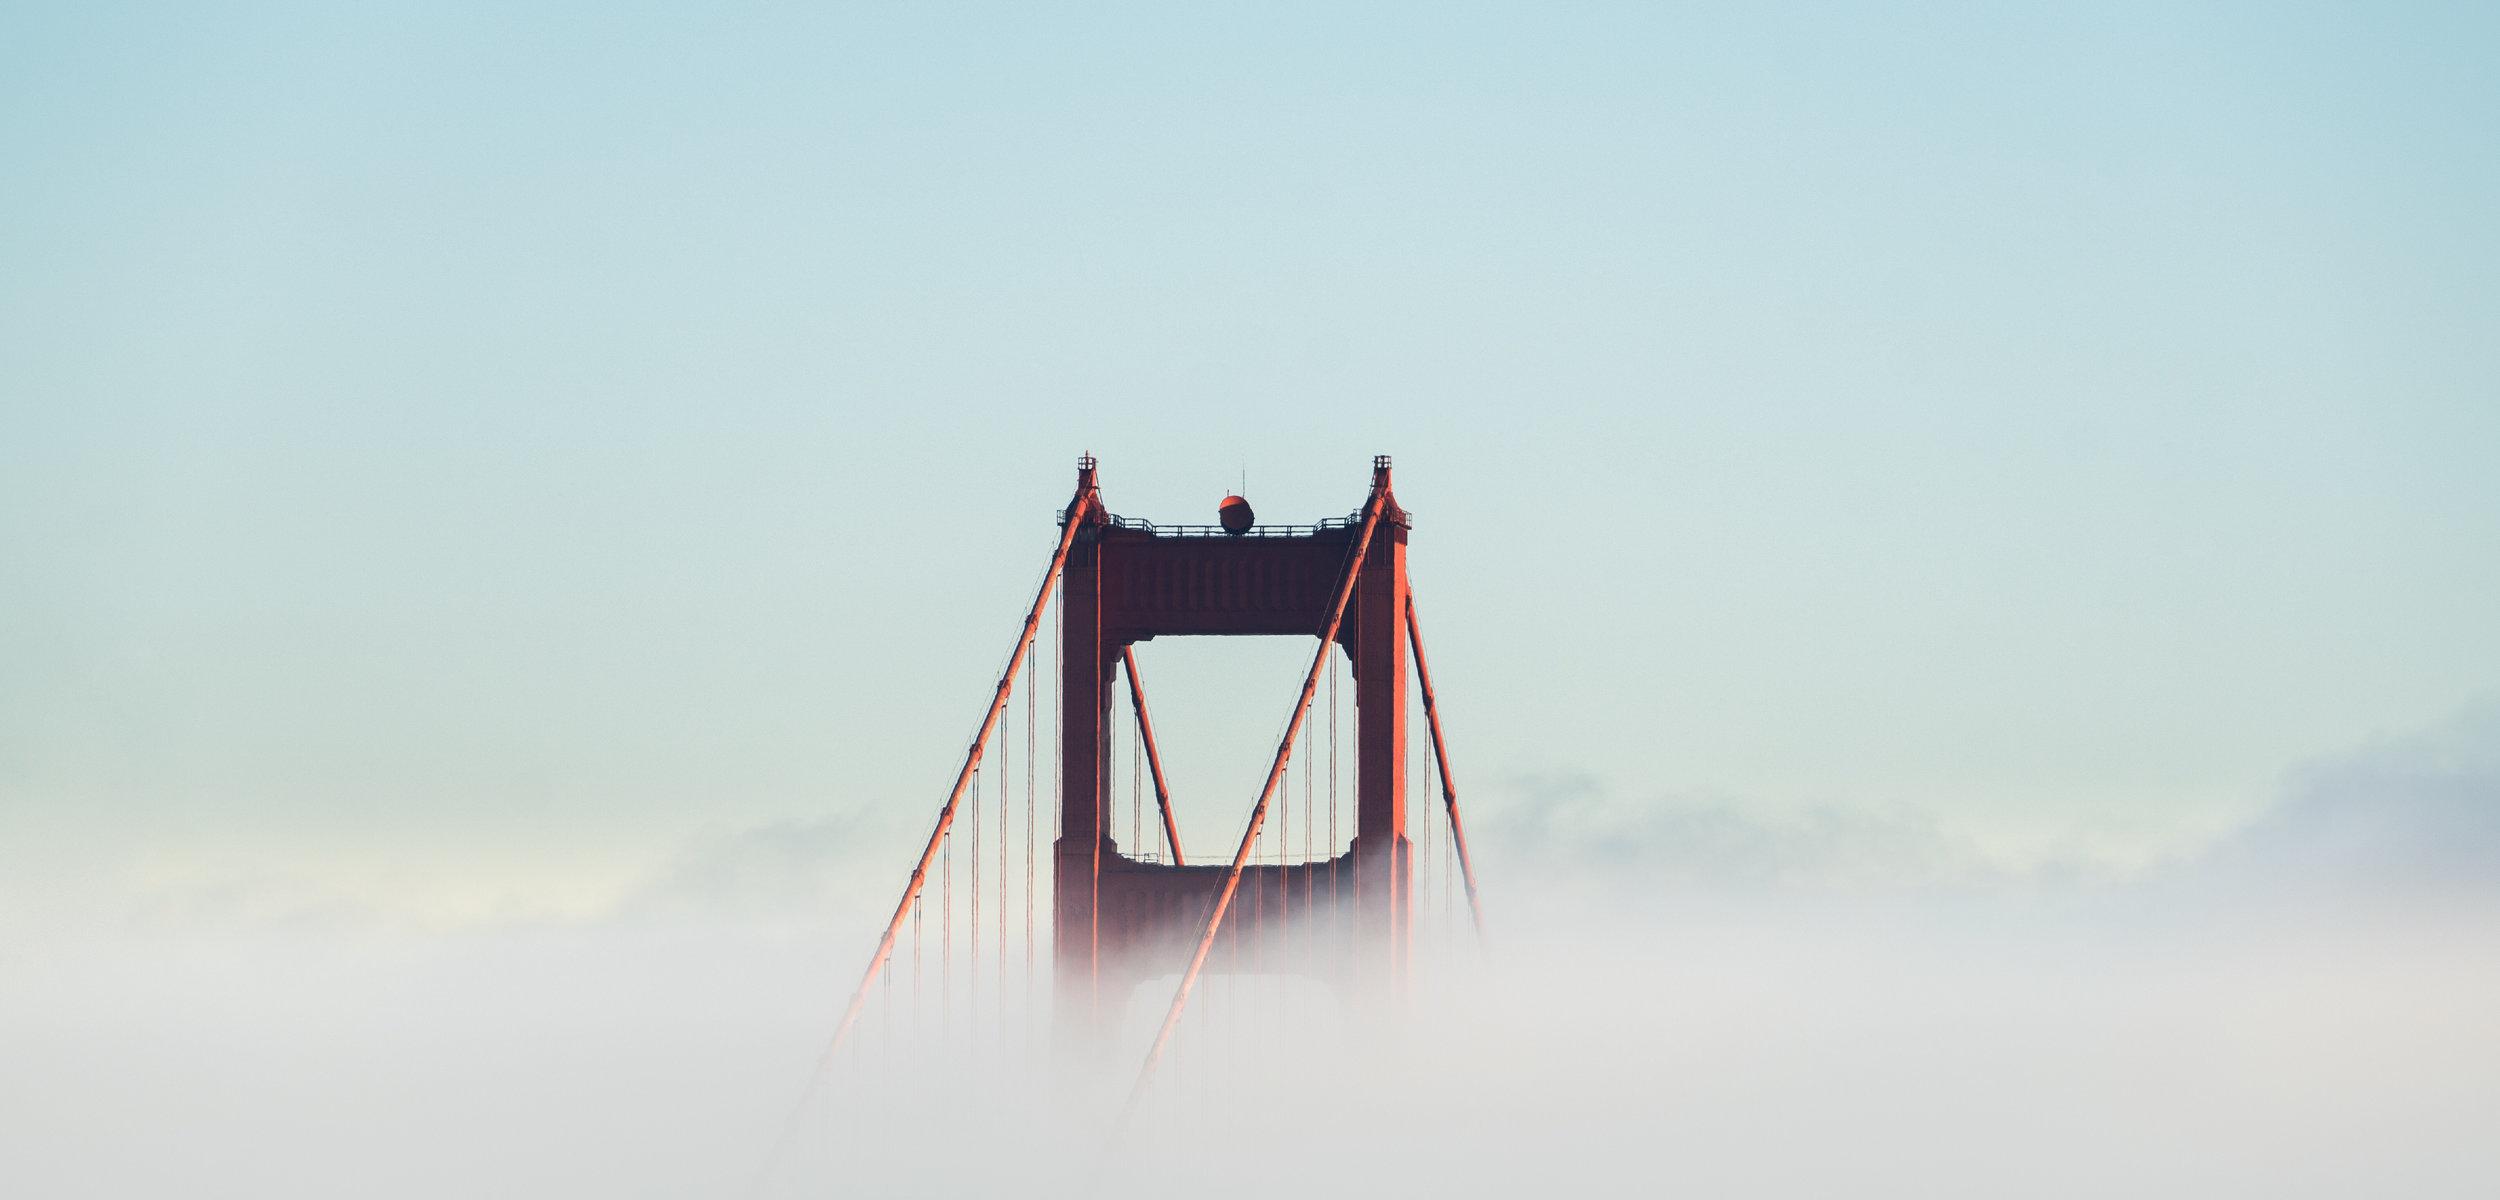 Golden Gate Bridge through the fog by  Joshua Sortino